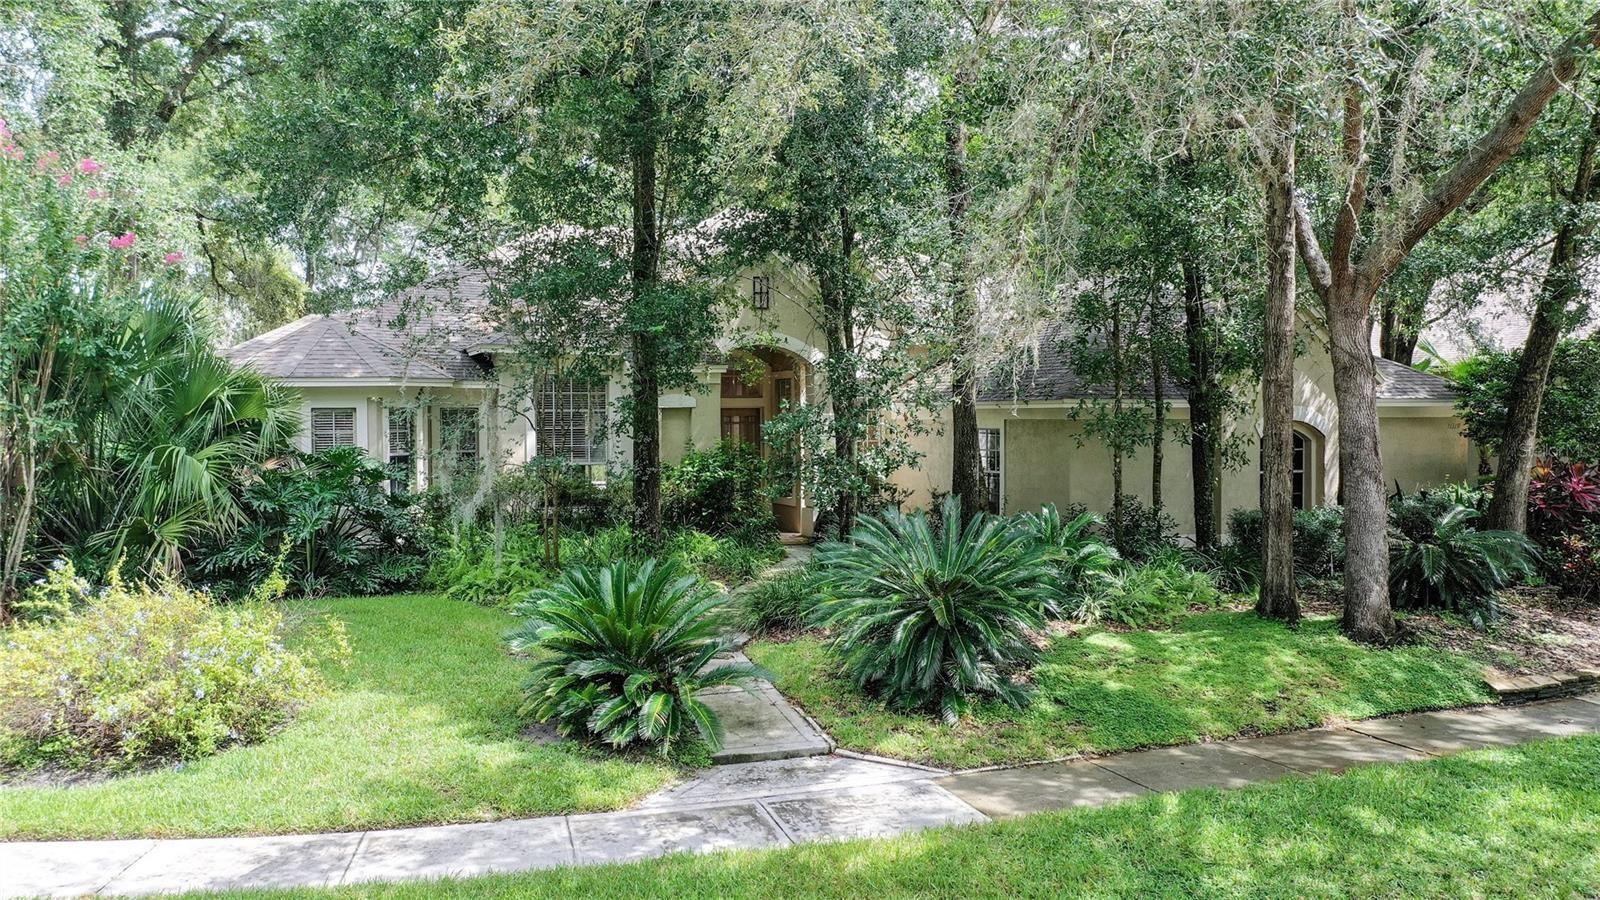 11319 RIVERBANK BOULEVARD, Orlando, FL 32817 - #: O5968712